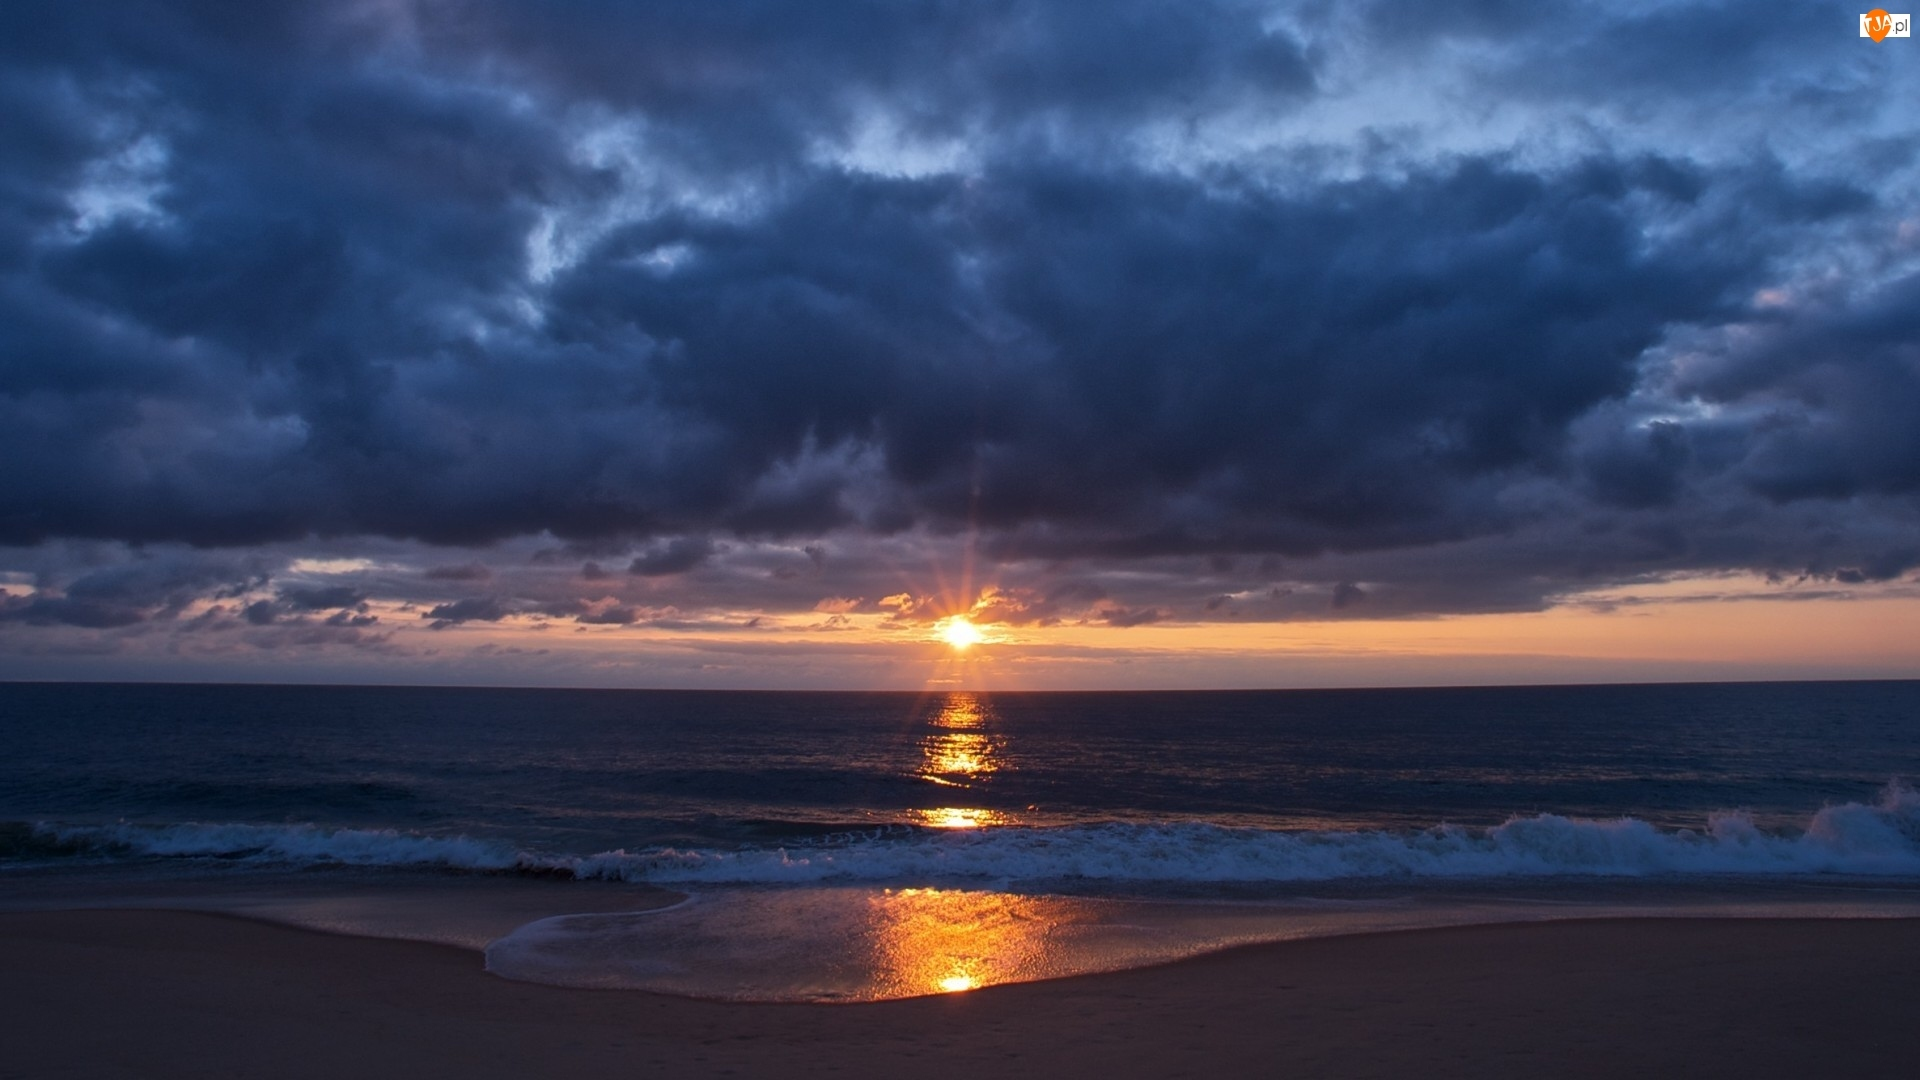 Morze, Zachód Słońca, Ciemne, Chmury